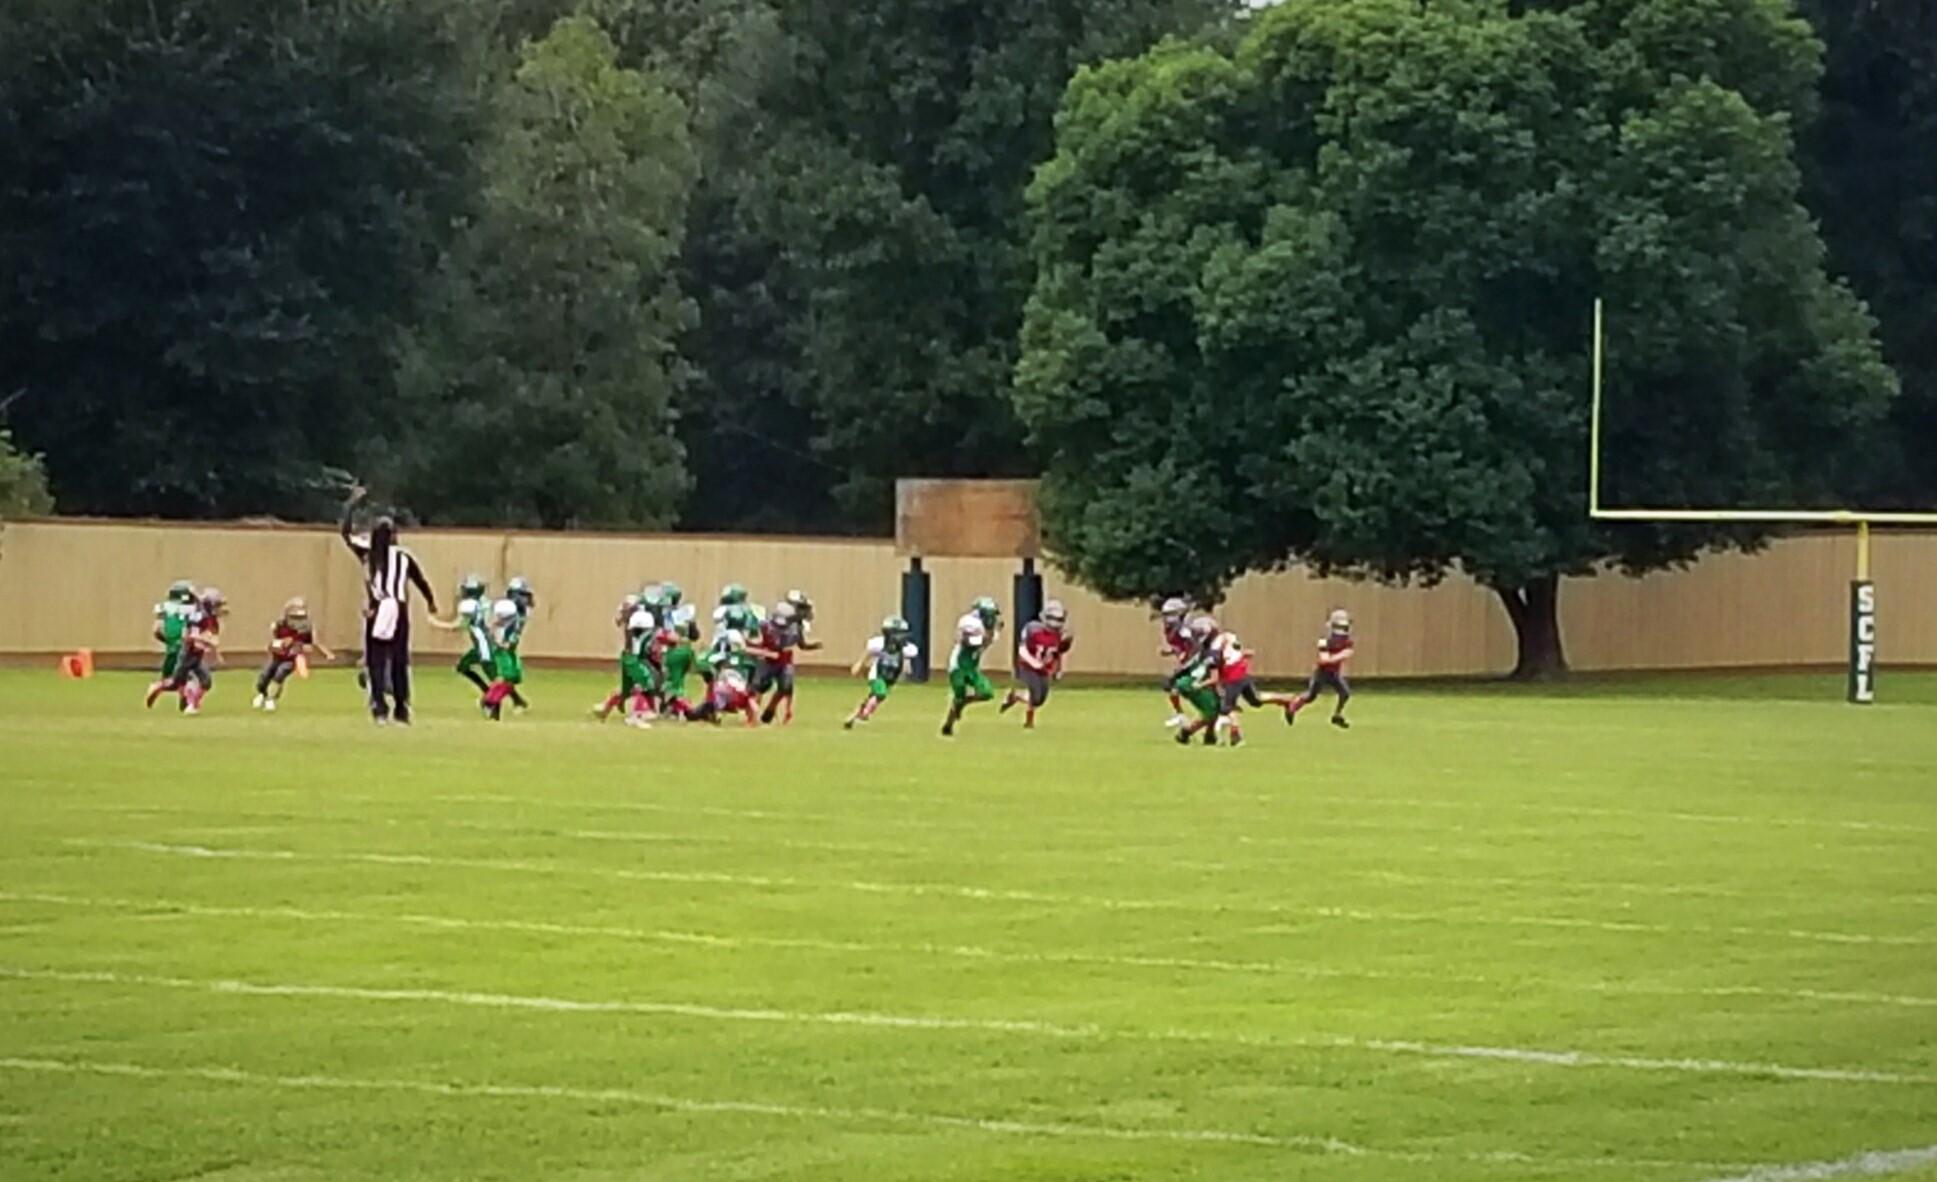 South County Football League (SCFL) At Gullo Park image 0